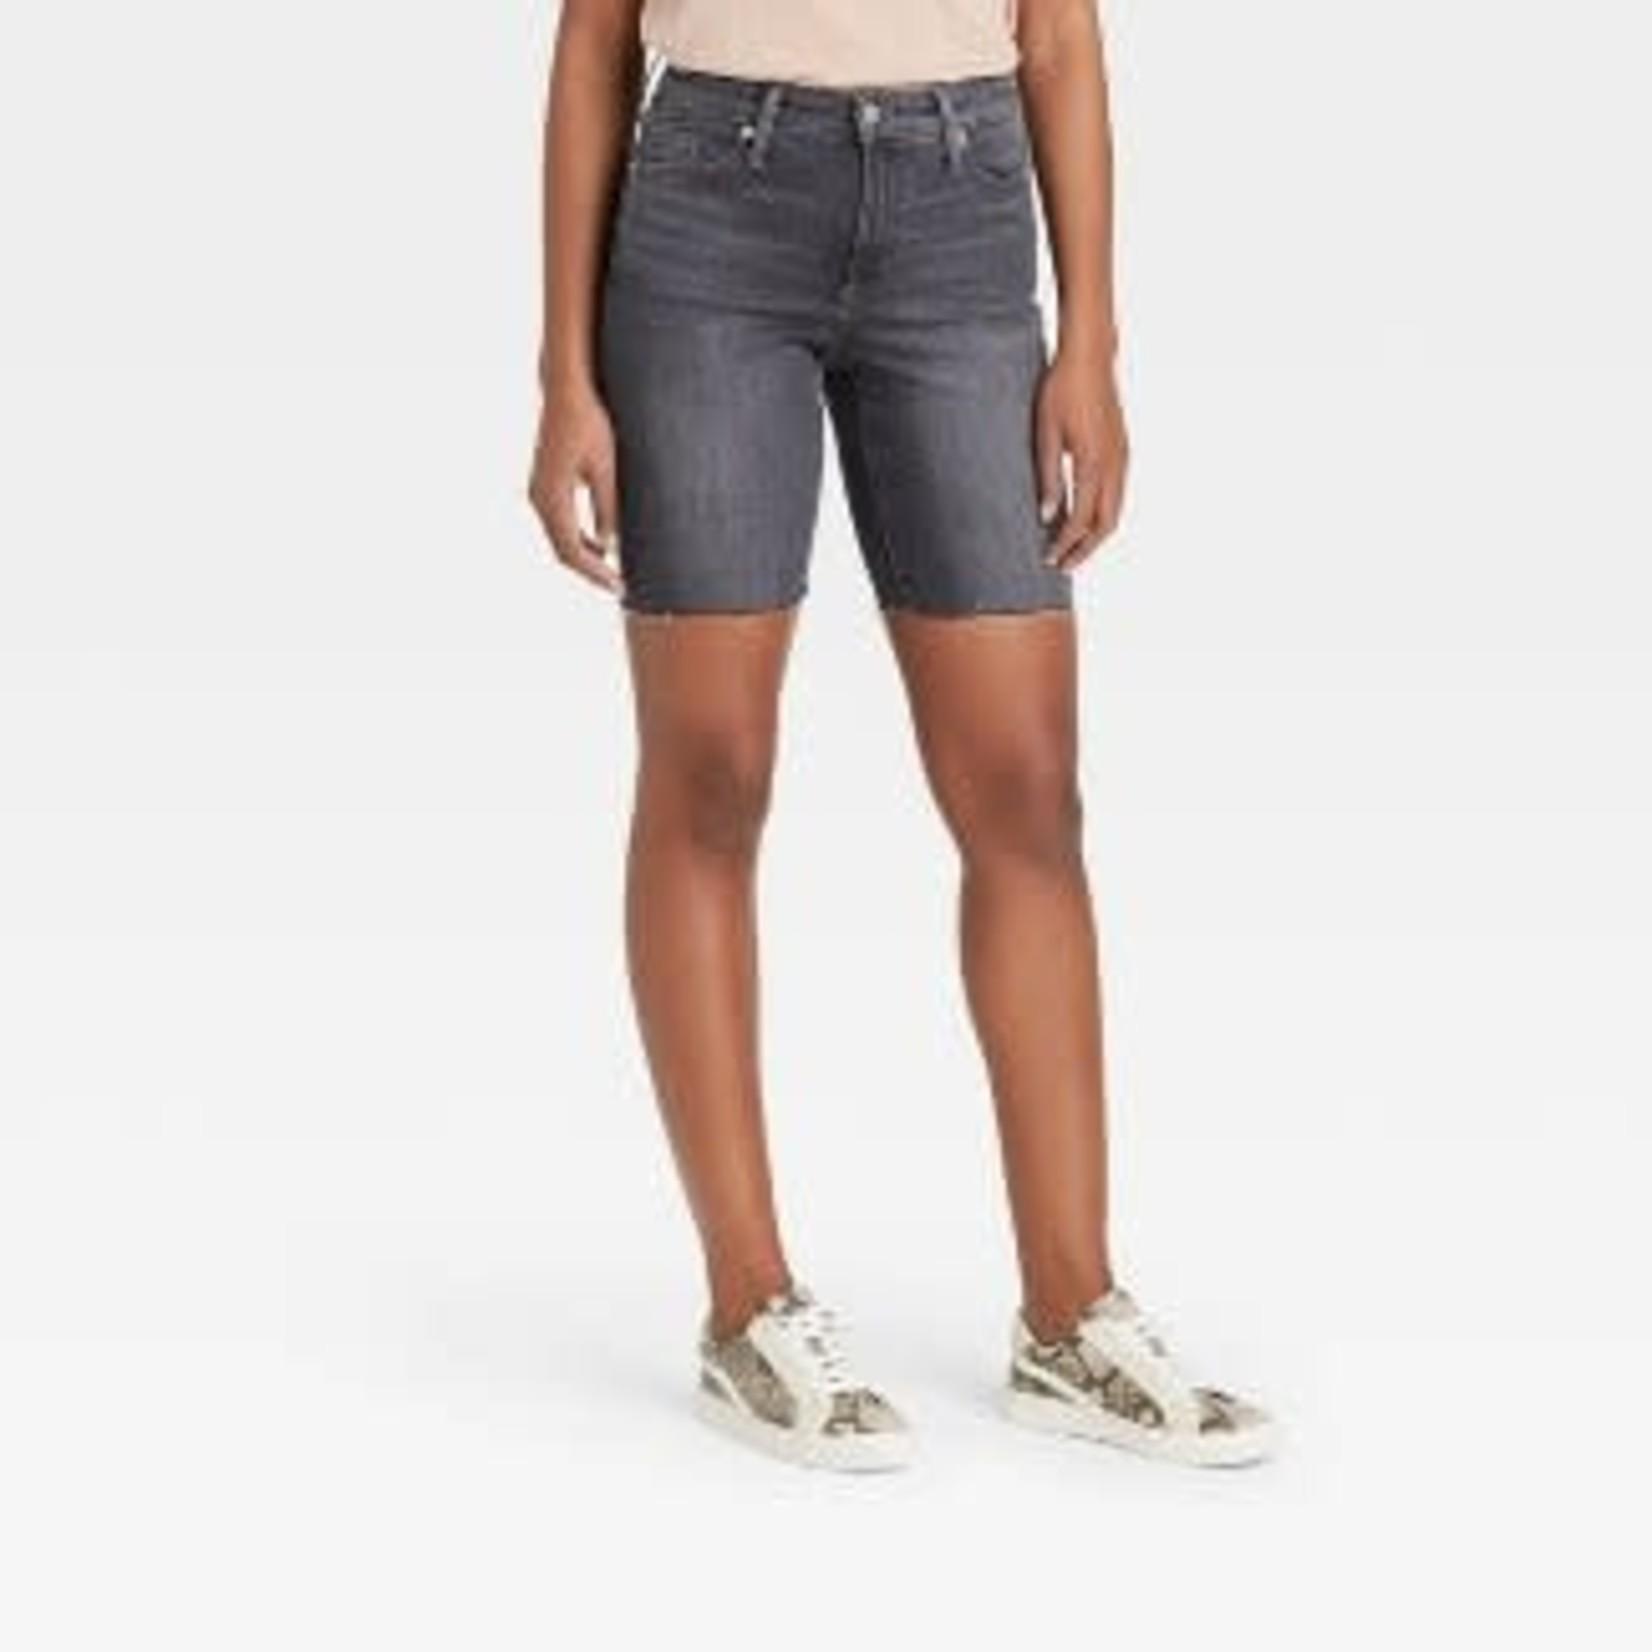 Universal Thread | Women's High-Rise Bermuda Jean Shorts Size 8